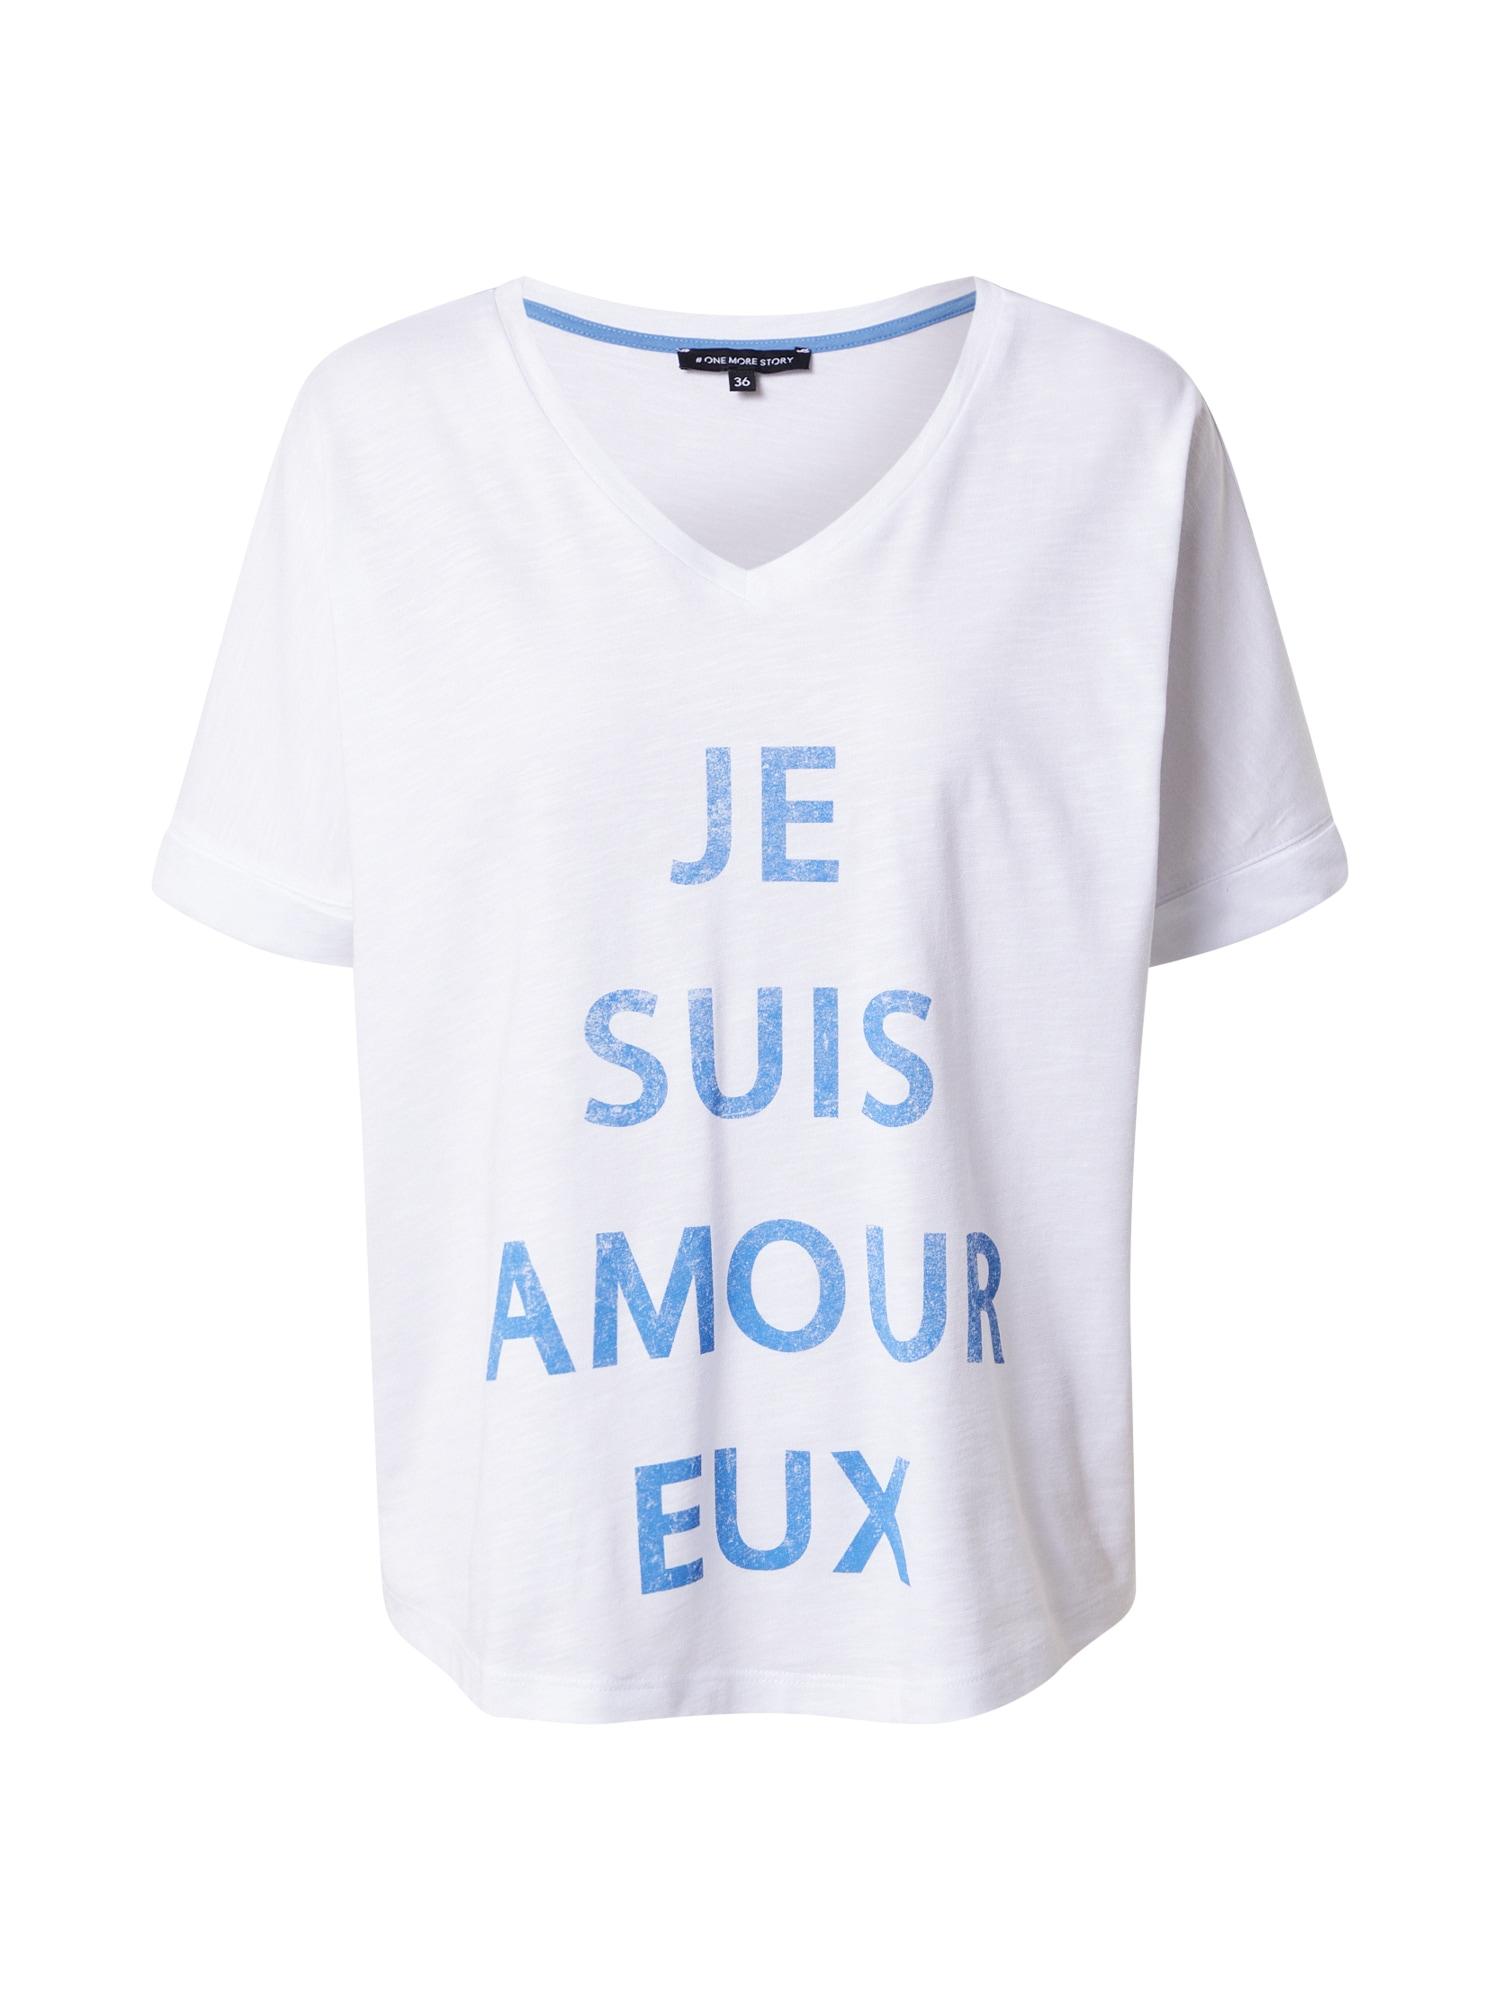 ONE MORE STORY Marškinėliai balkšva / mėlyna dūmų spalva